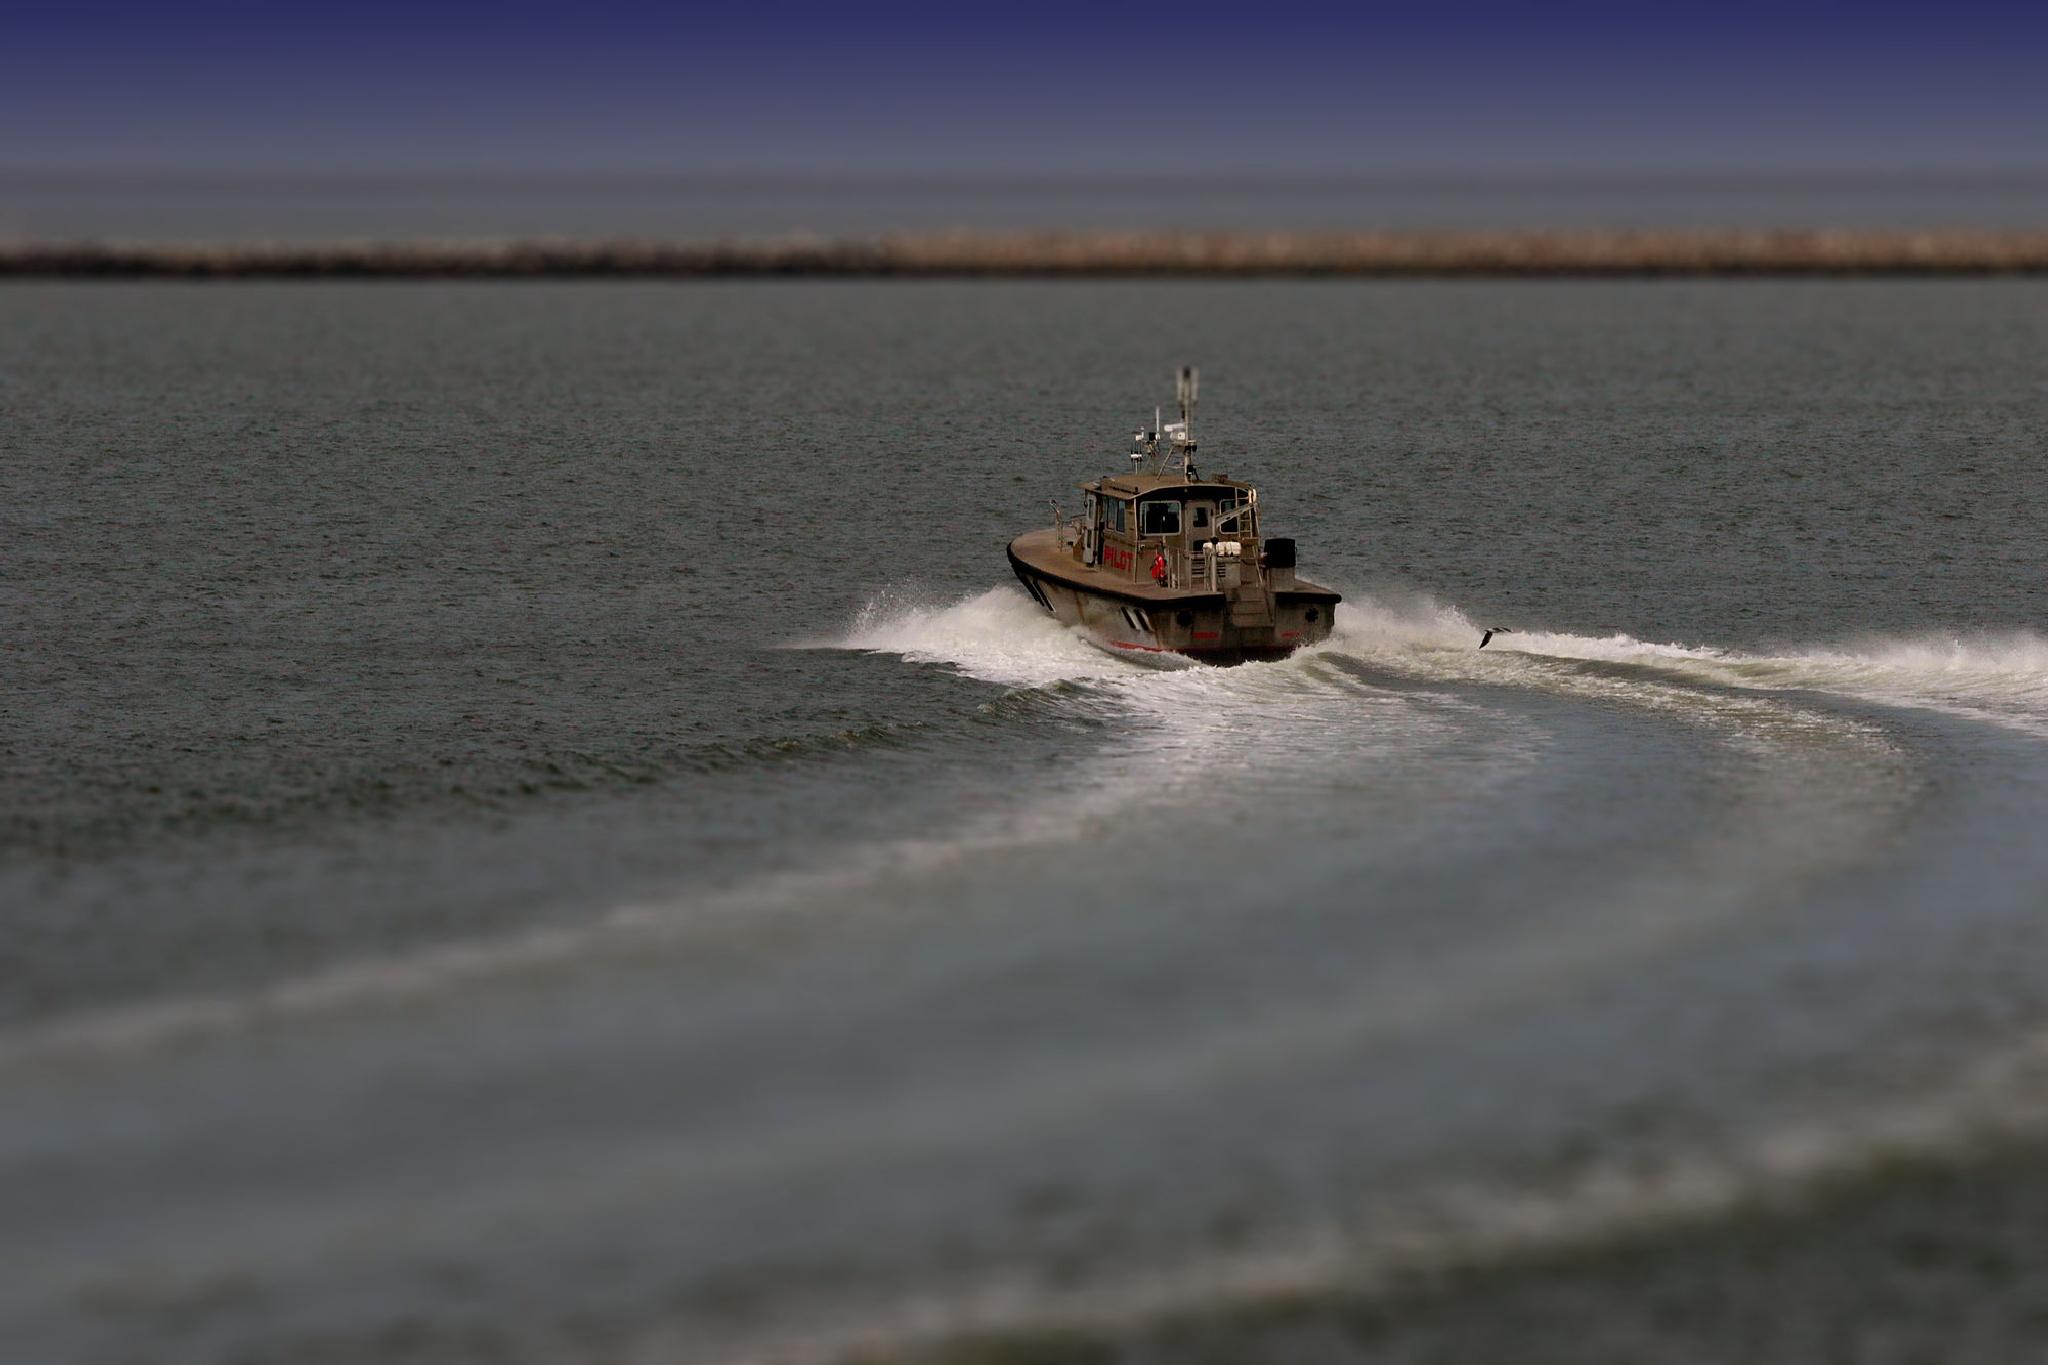 Pilot Boat by Doug Bottalico